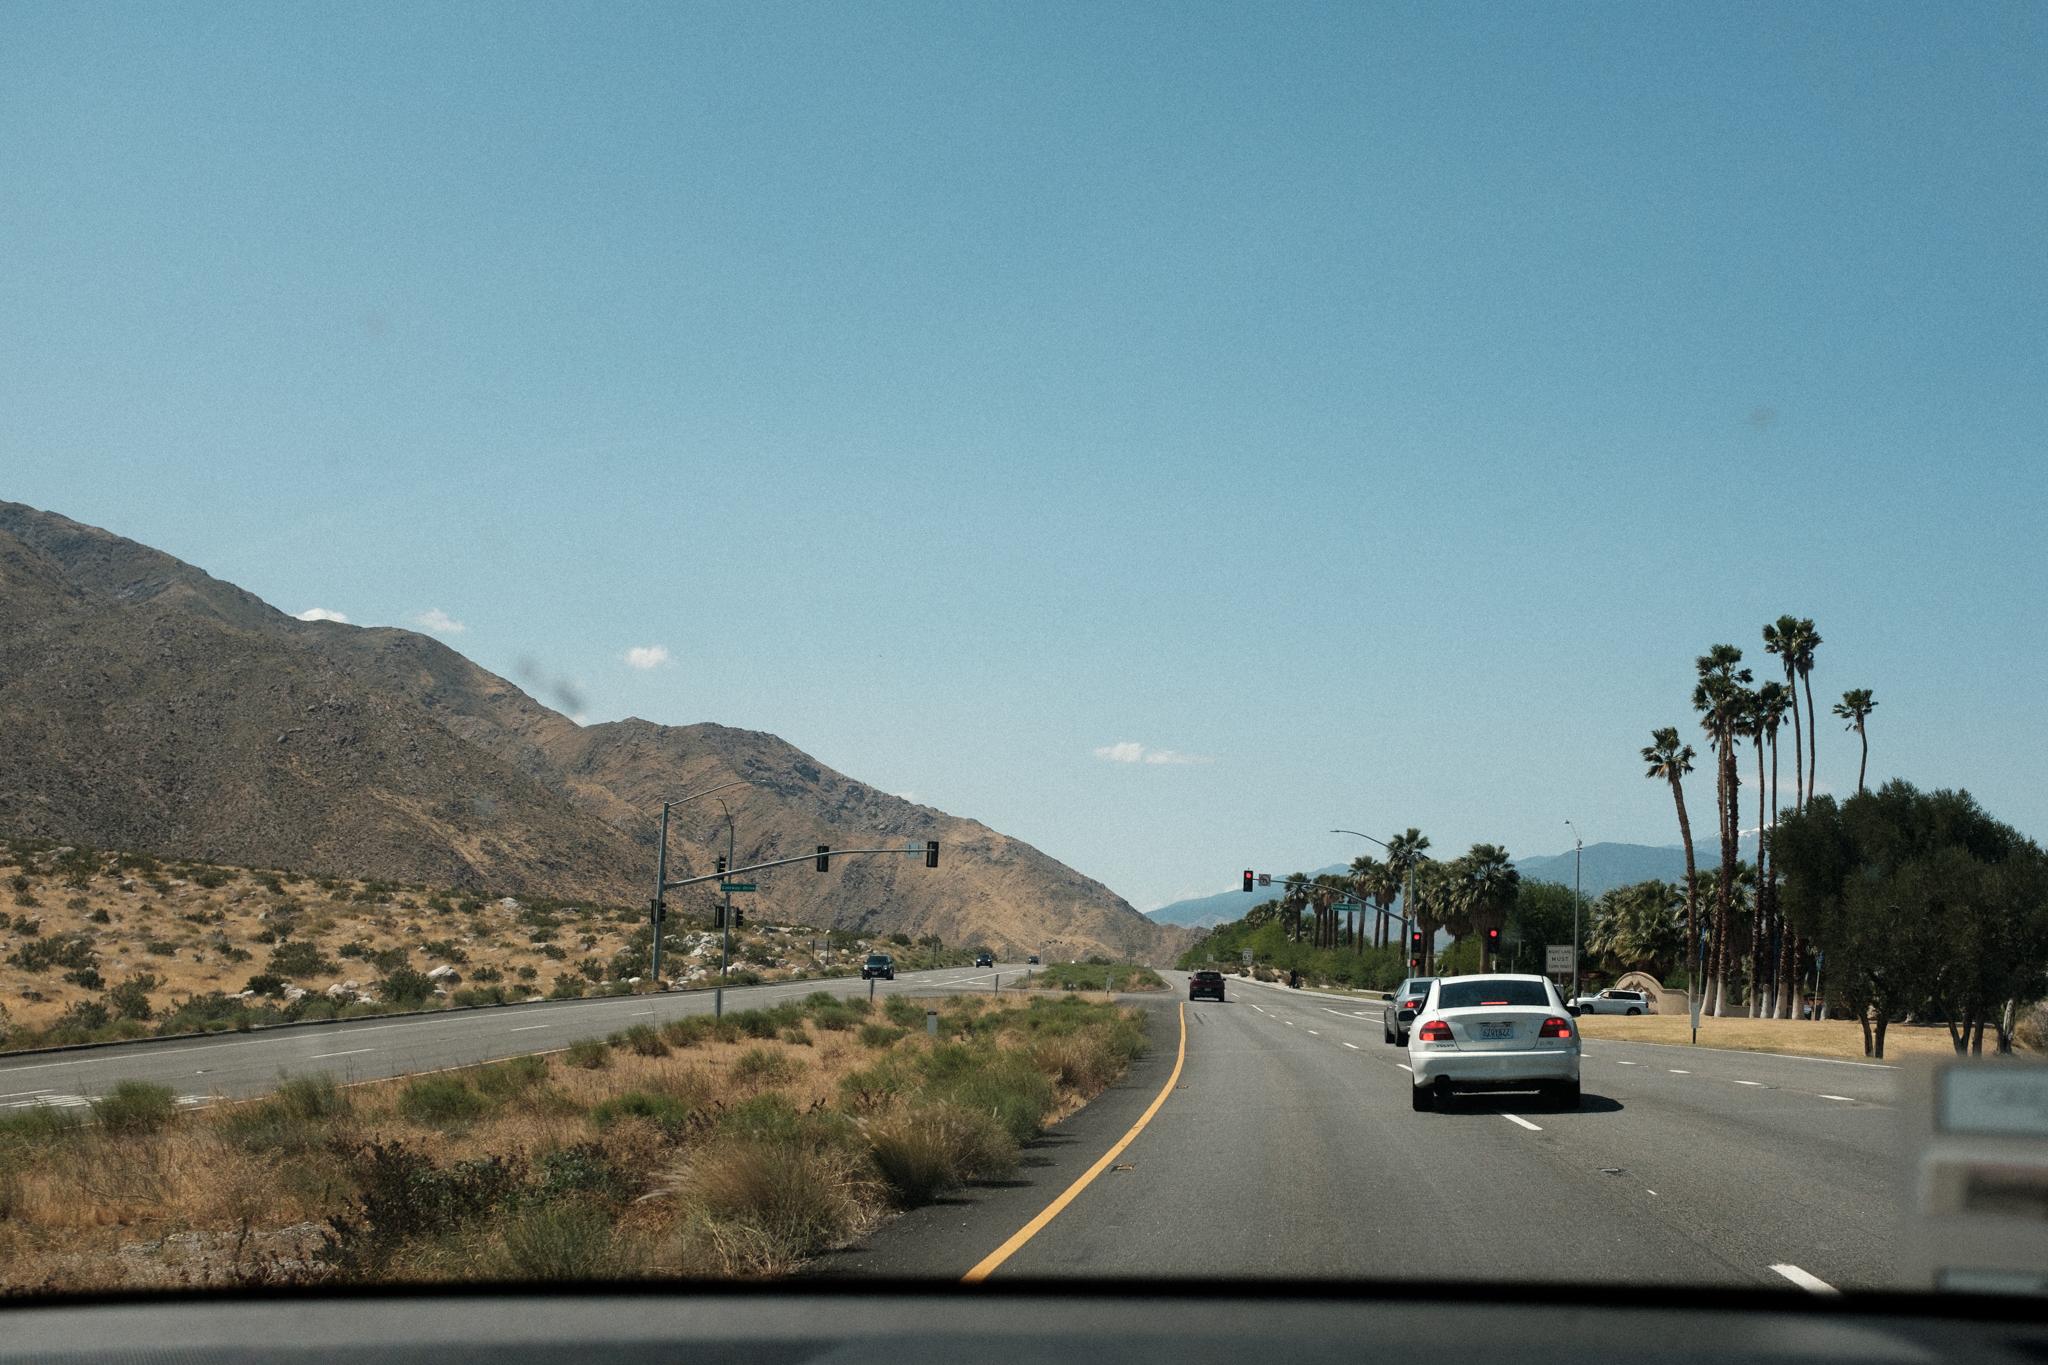 170418 Coachella 17 w1 1510.jpg